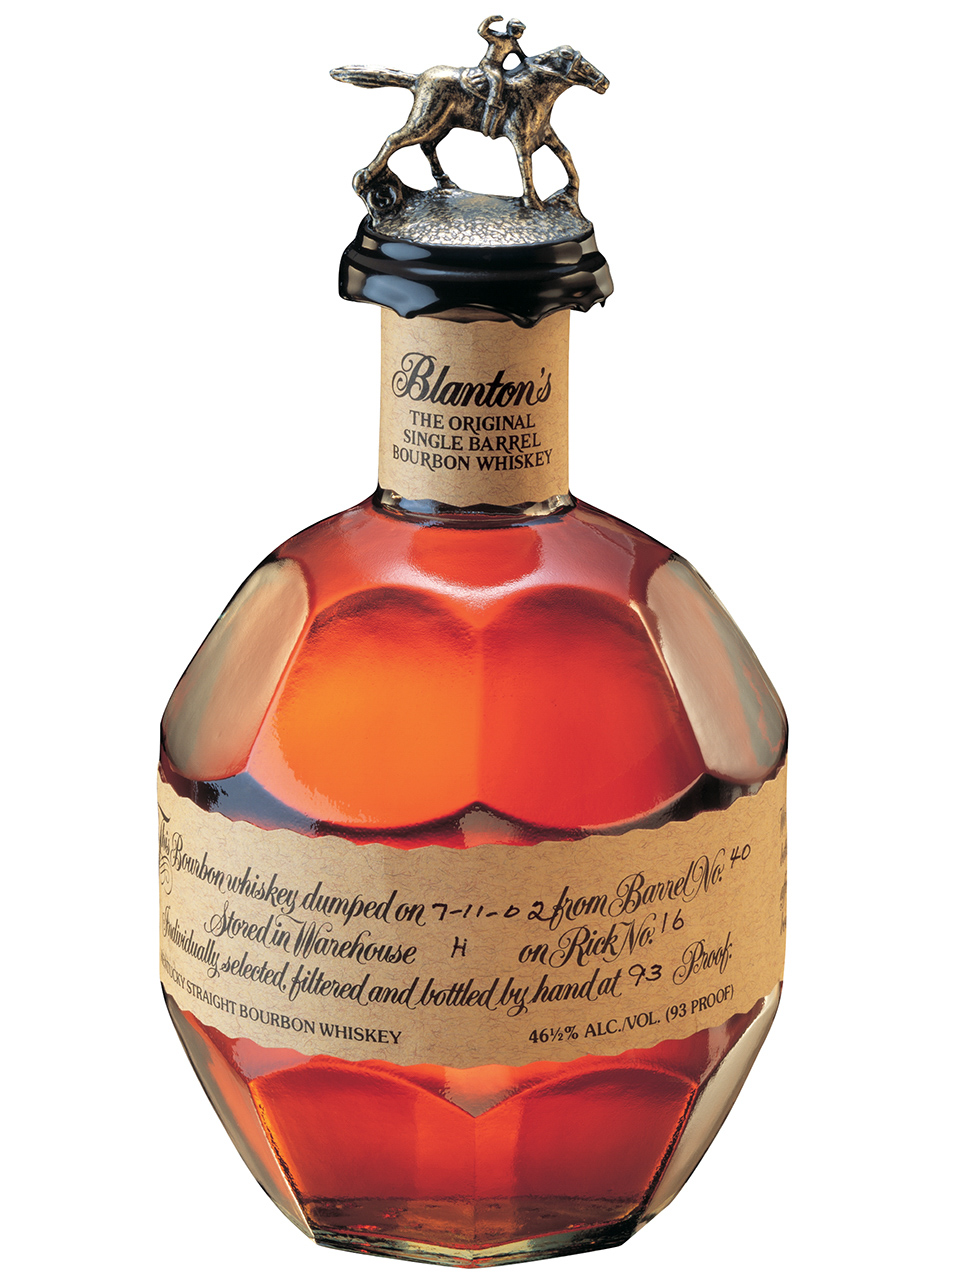 Blantons The Original Single Barrel Bourbon